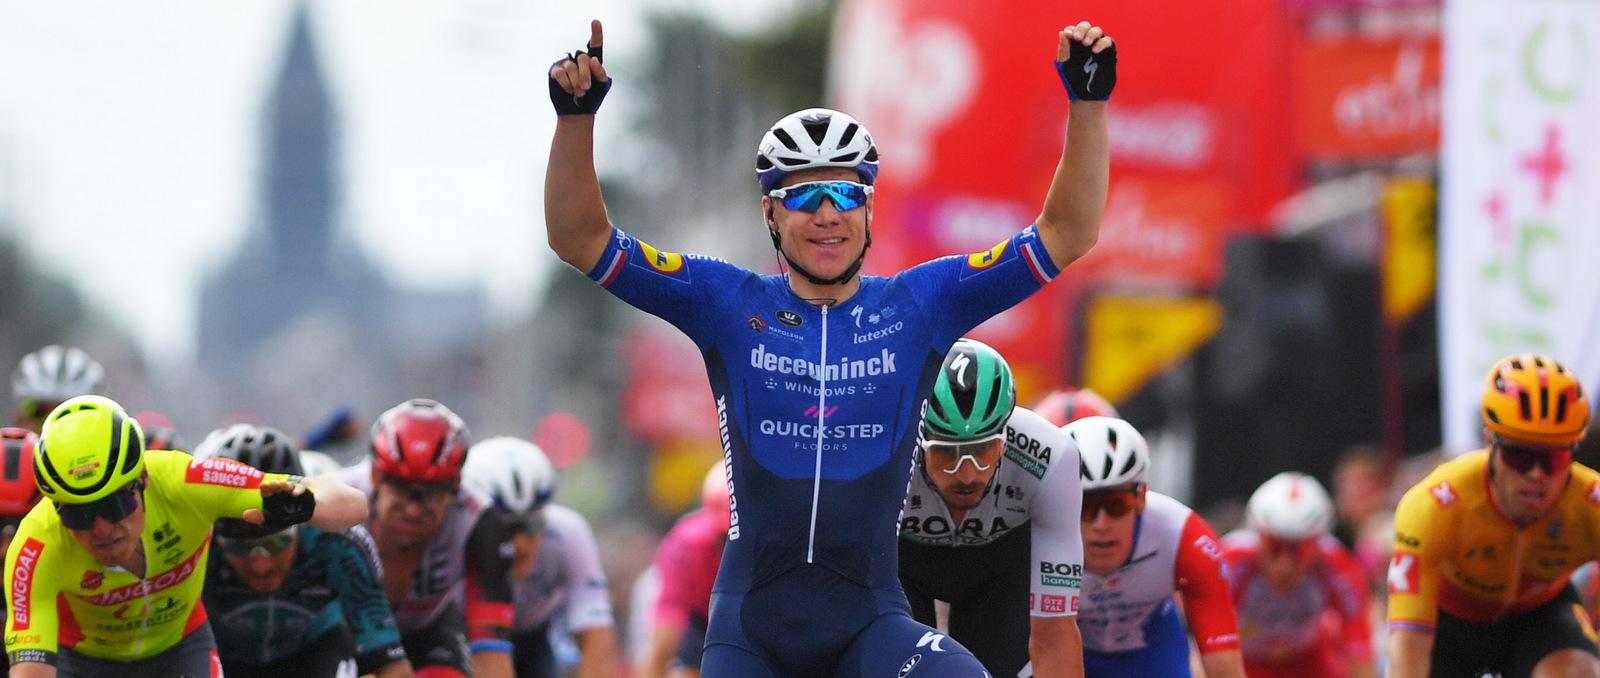 Vuelta 2021: Fabio Jakobsen vince la 4^ tappa